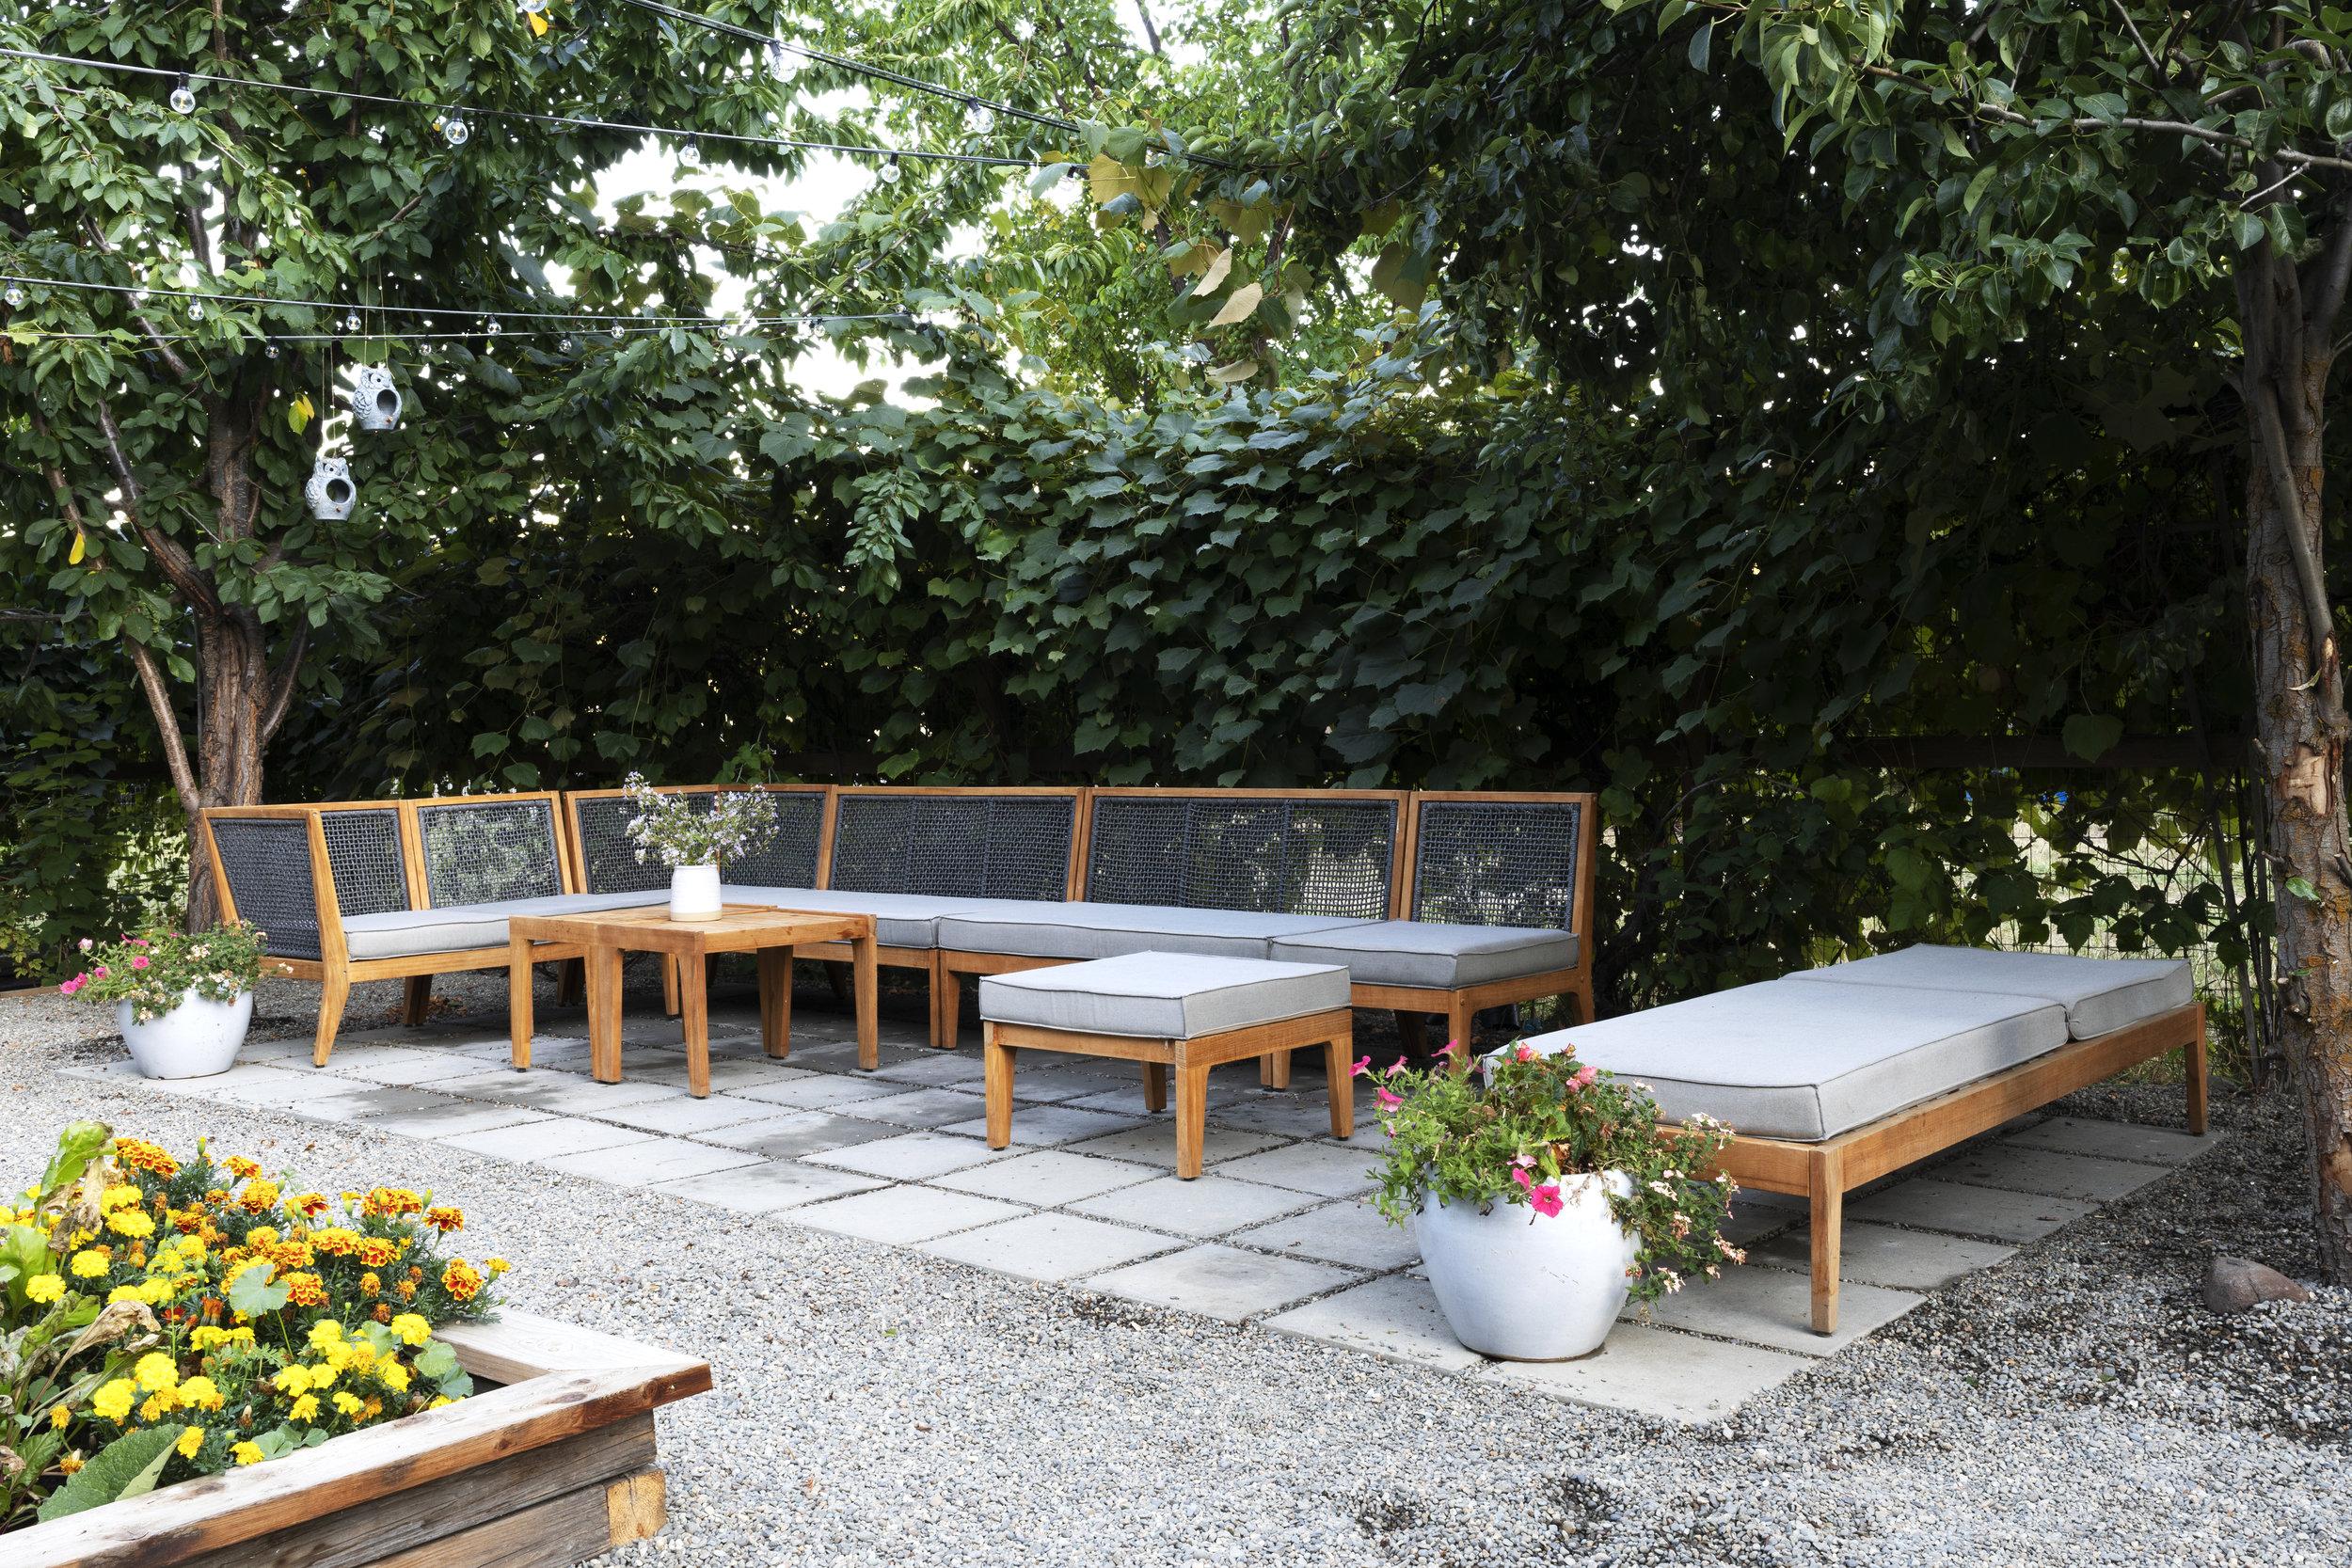 The Grit and Polish - Farmhouse Garden Patio Furniture 3.jpg